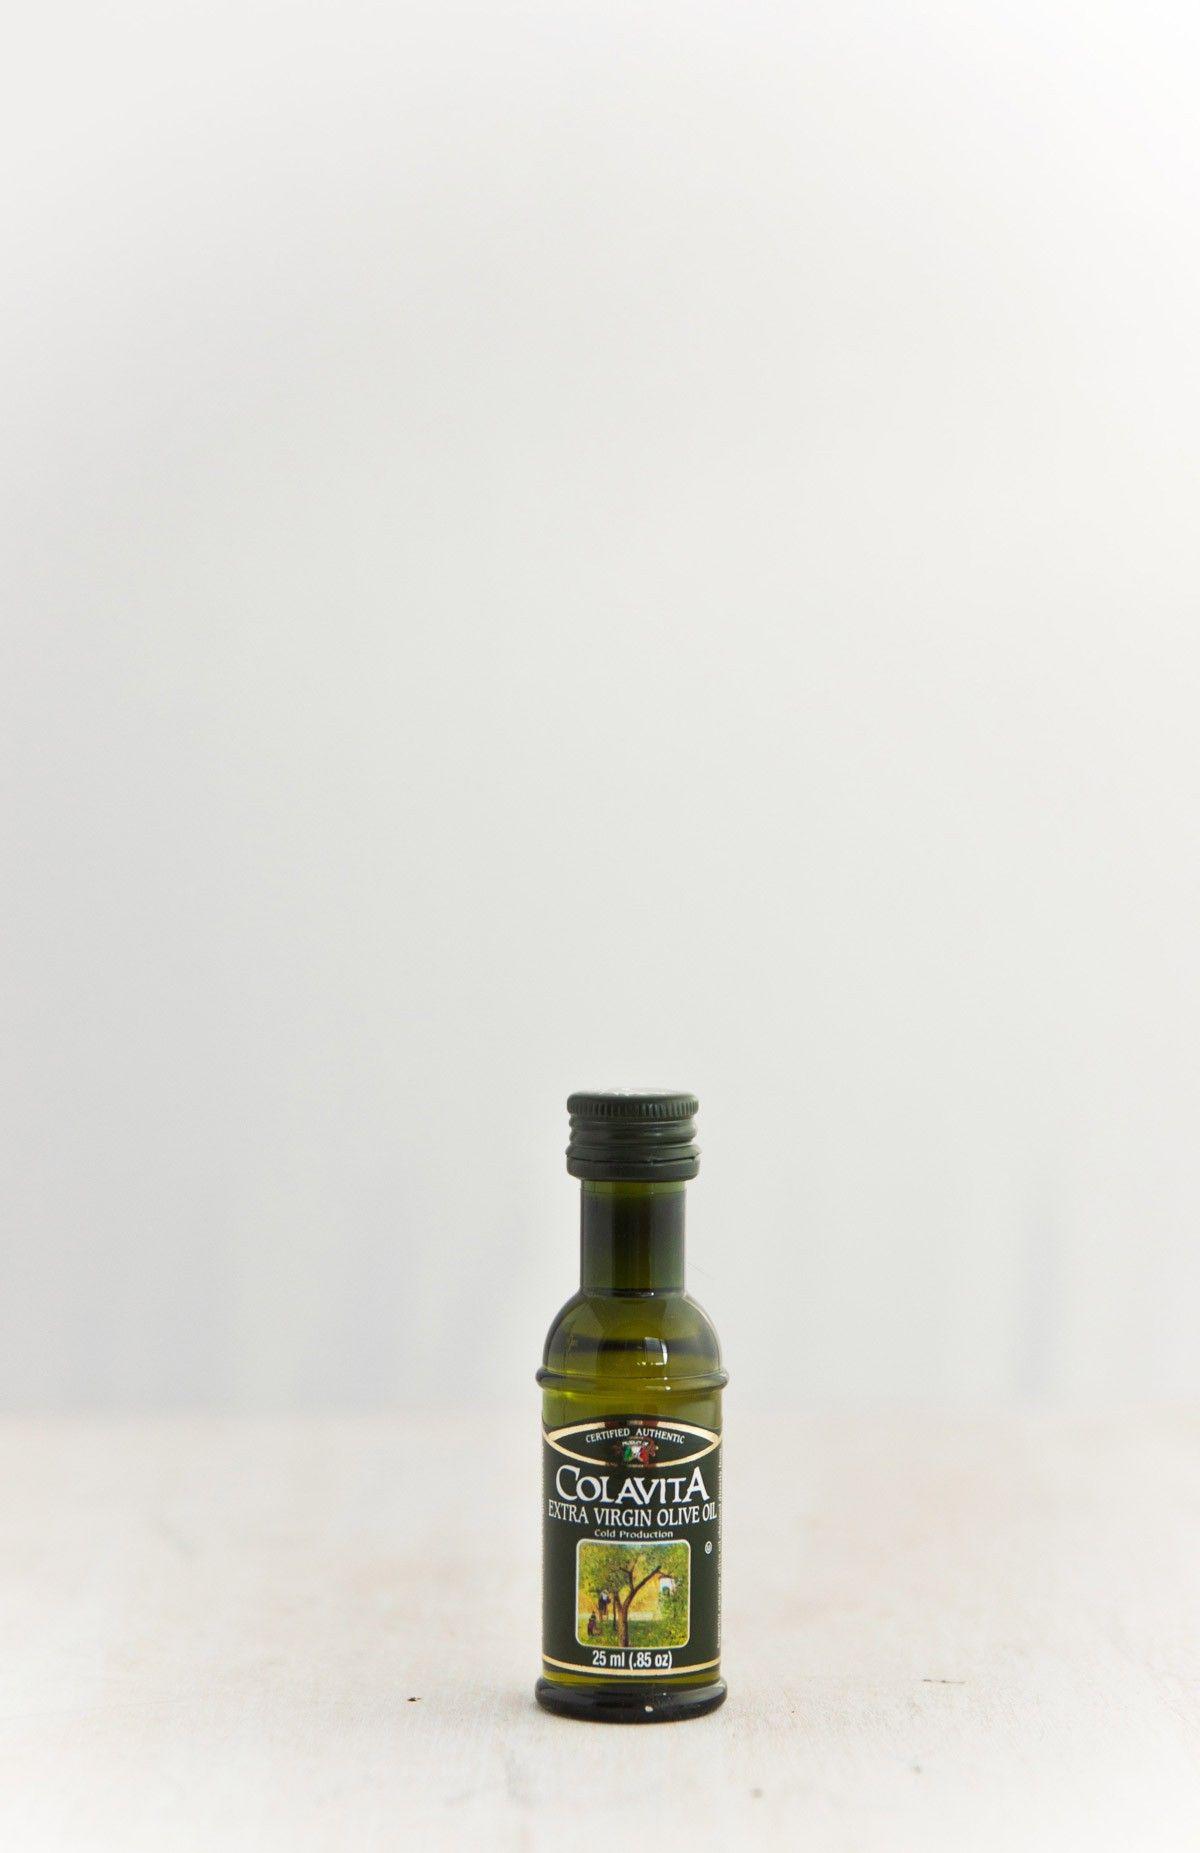 Mini Colavita Extra Virgin Olive Oils 25ml   Olive oil+zeytinyağı ...